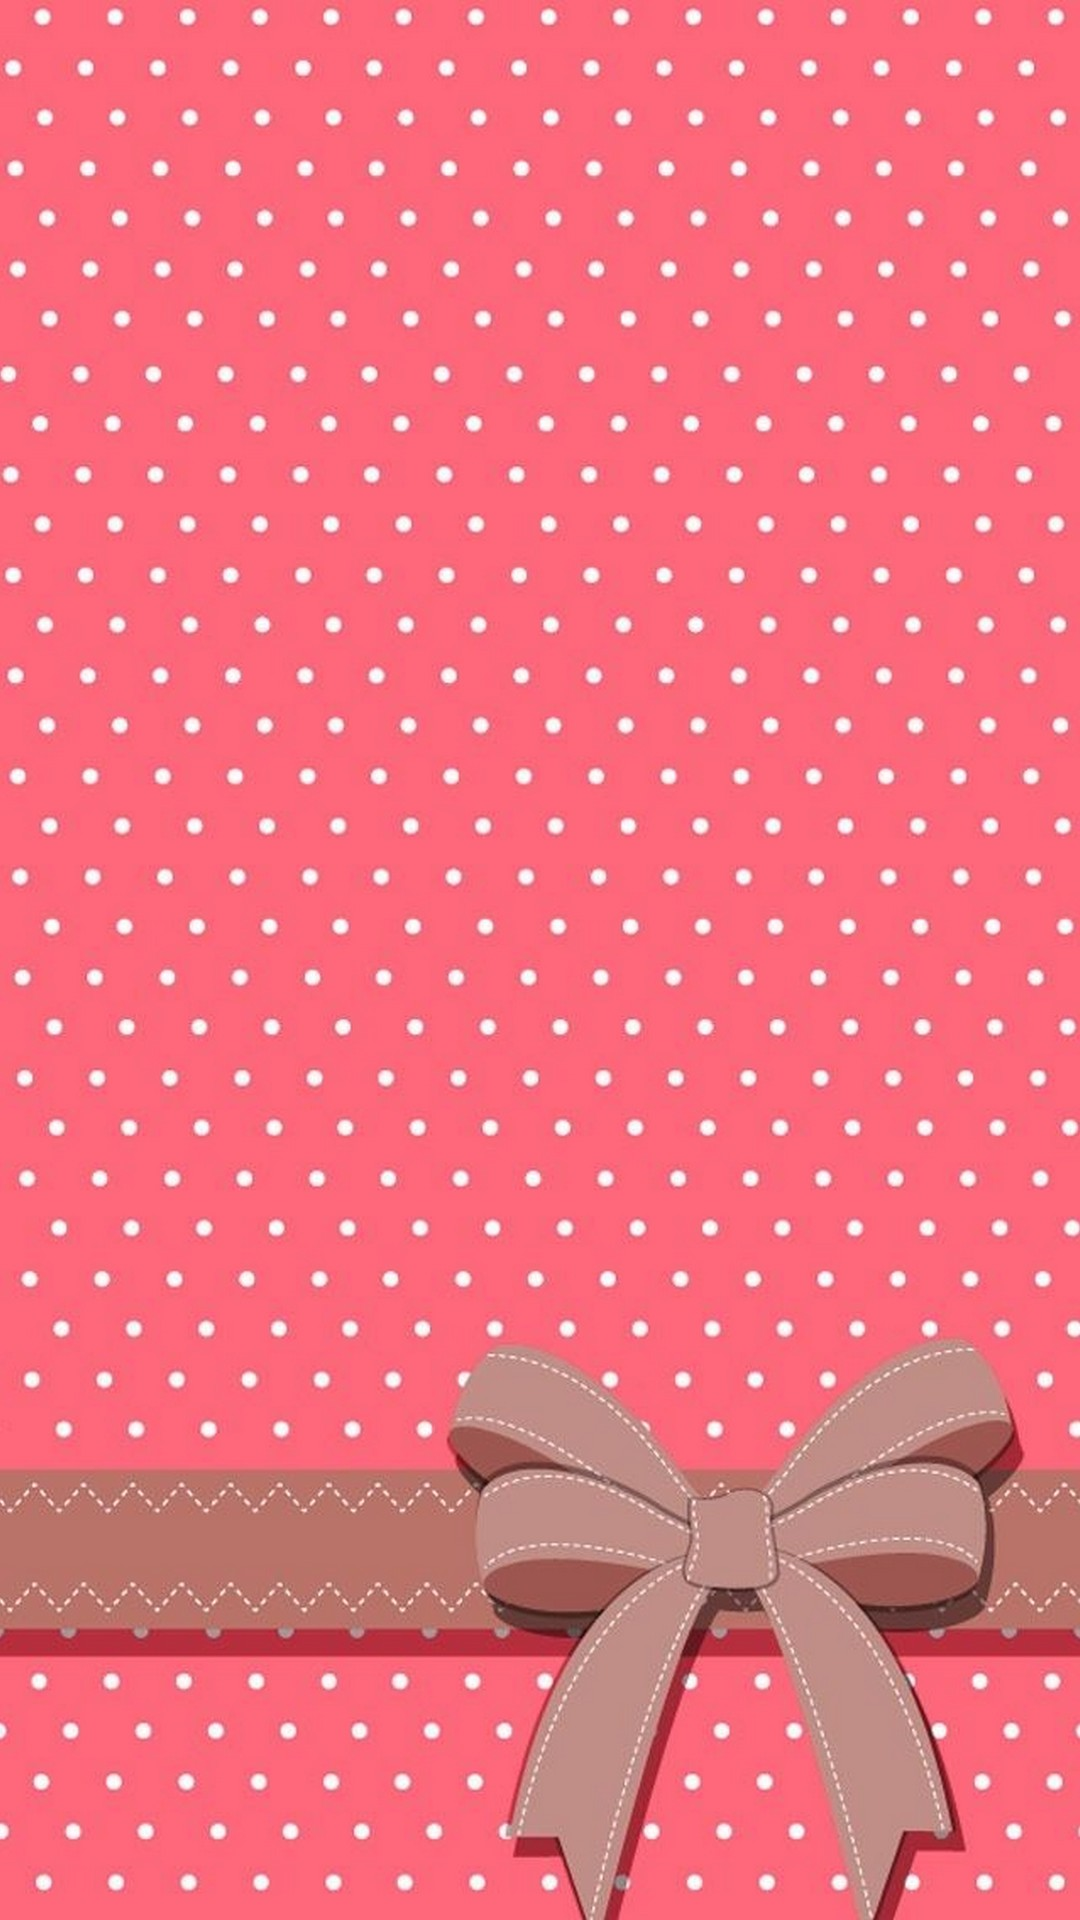 Cute Girly Wallpaper iPhone 7   2019 Cute Wallpapers